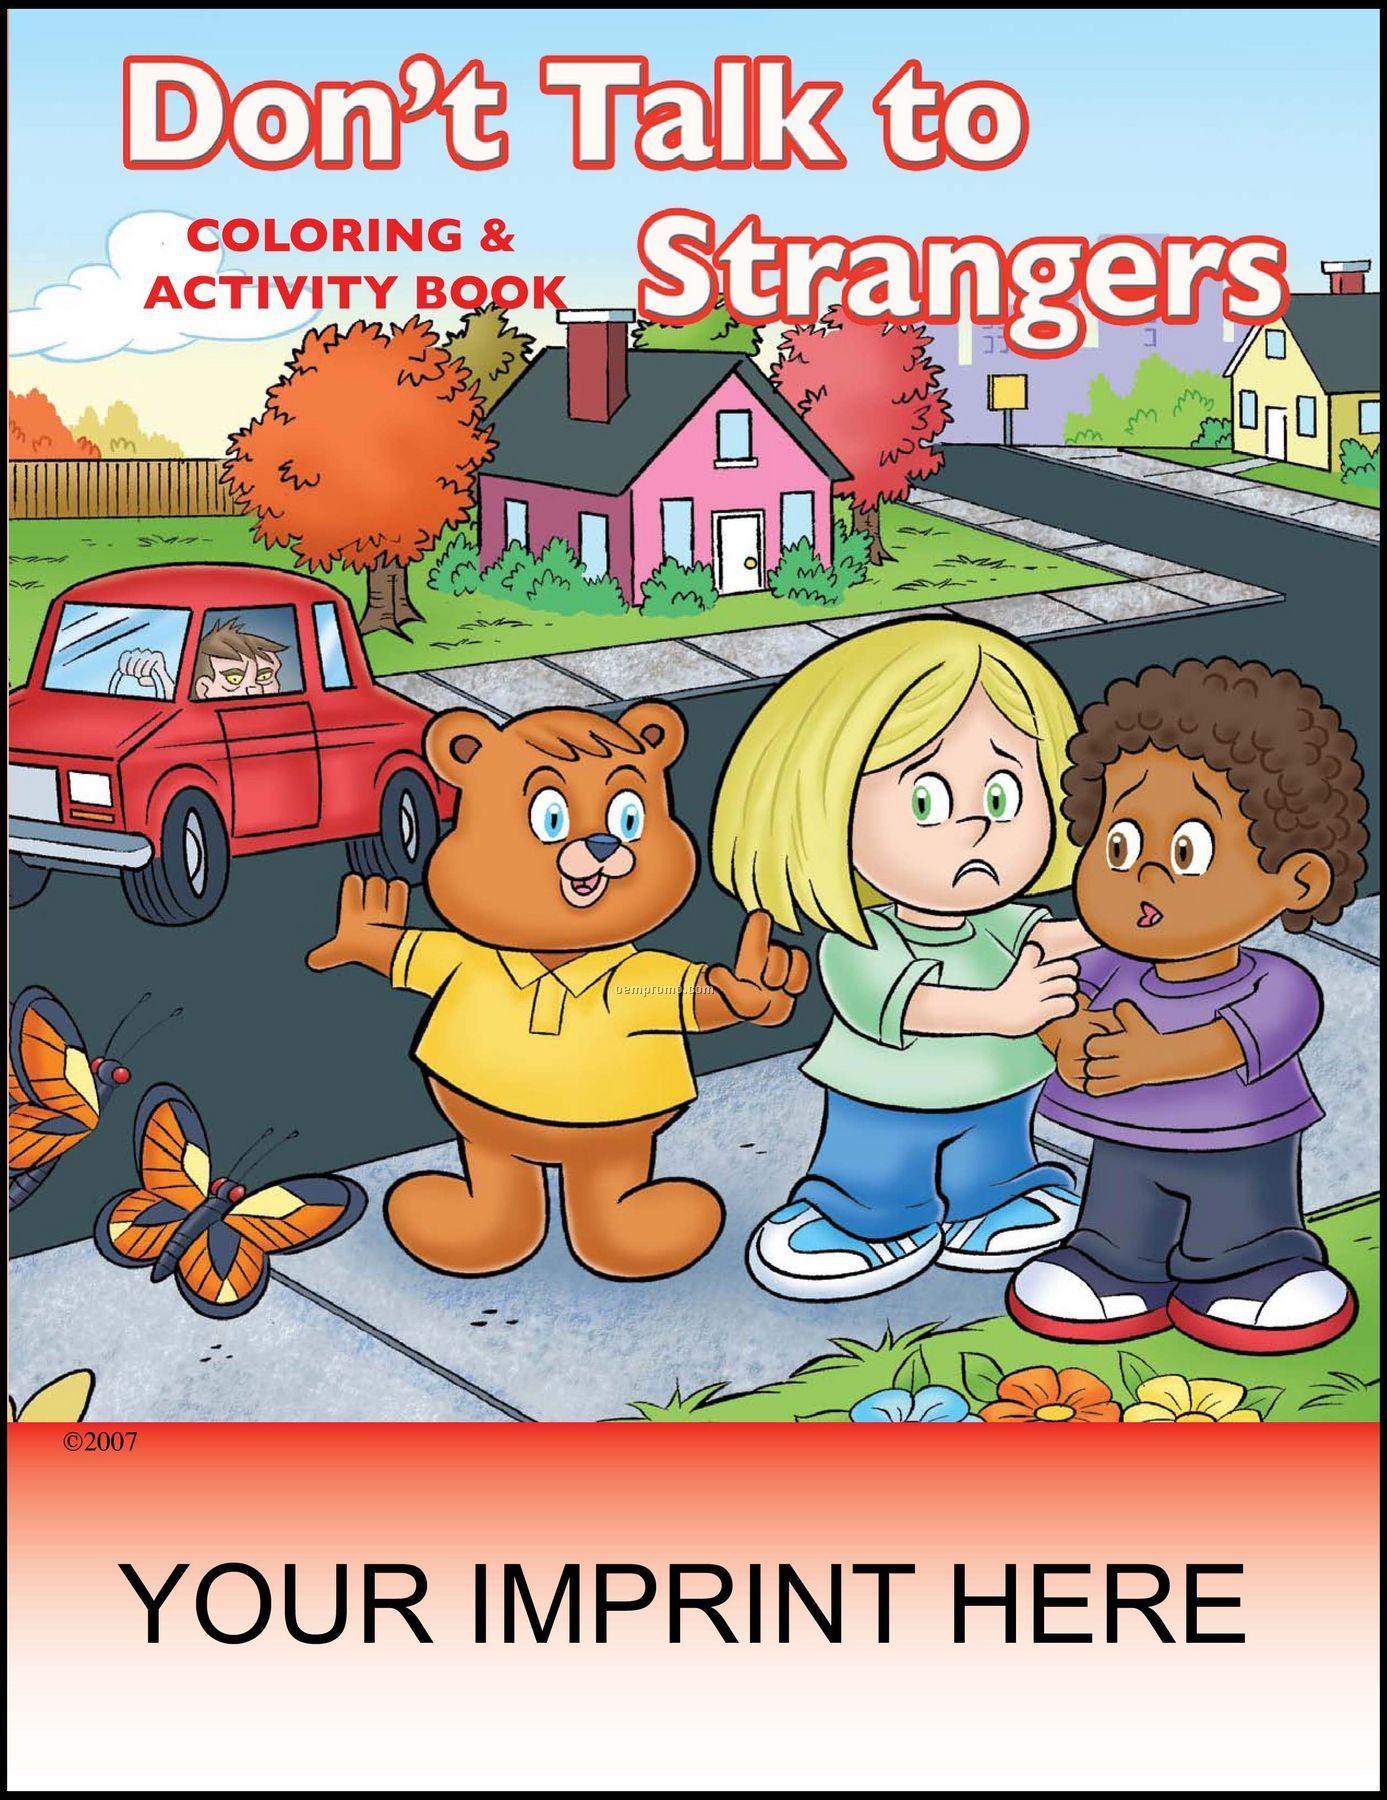 meet strangers online nursery